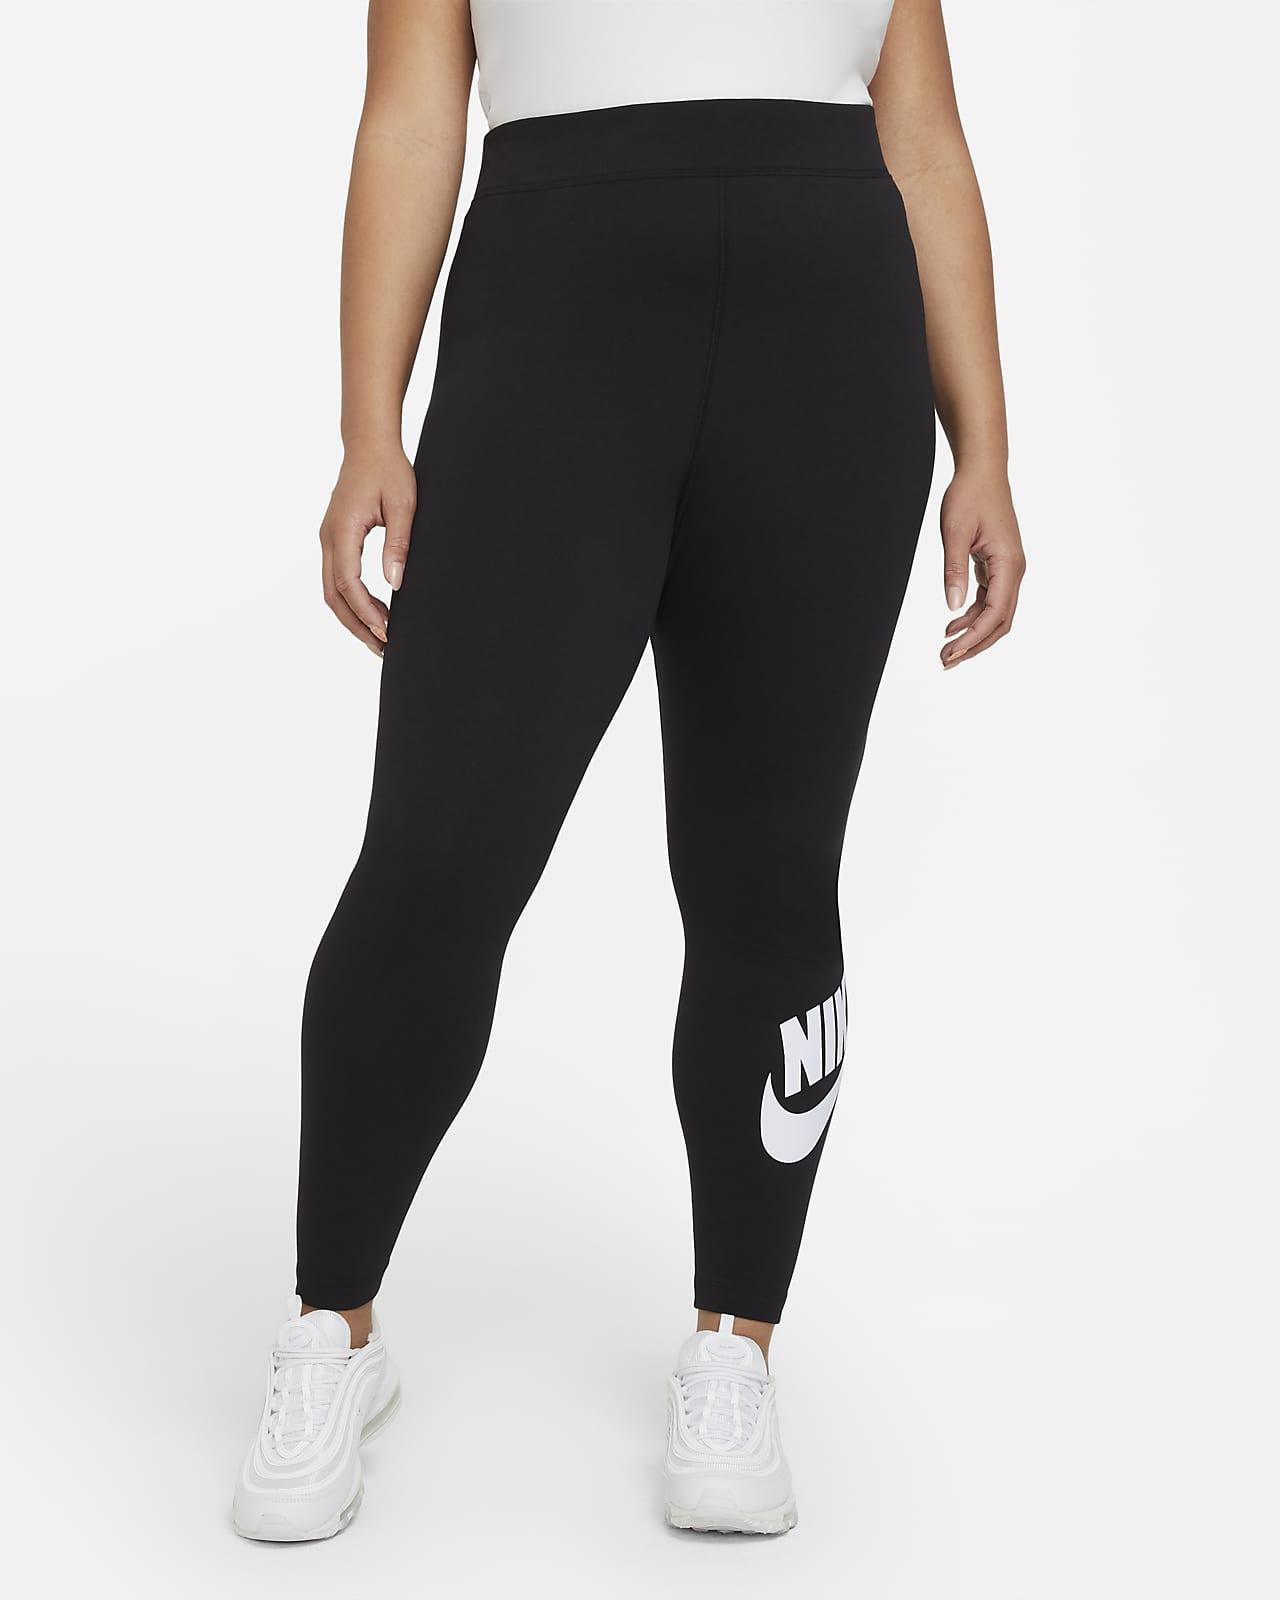 Nike Sportswear Essential Leggings de talle alto (Talla grande) - Mujer